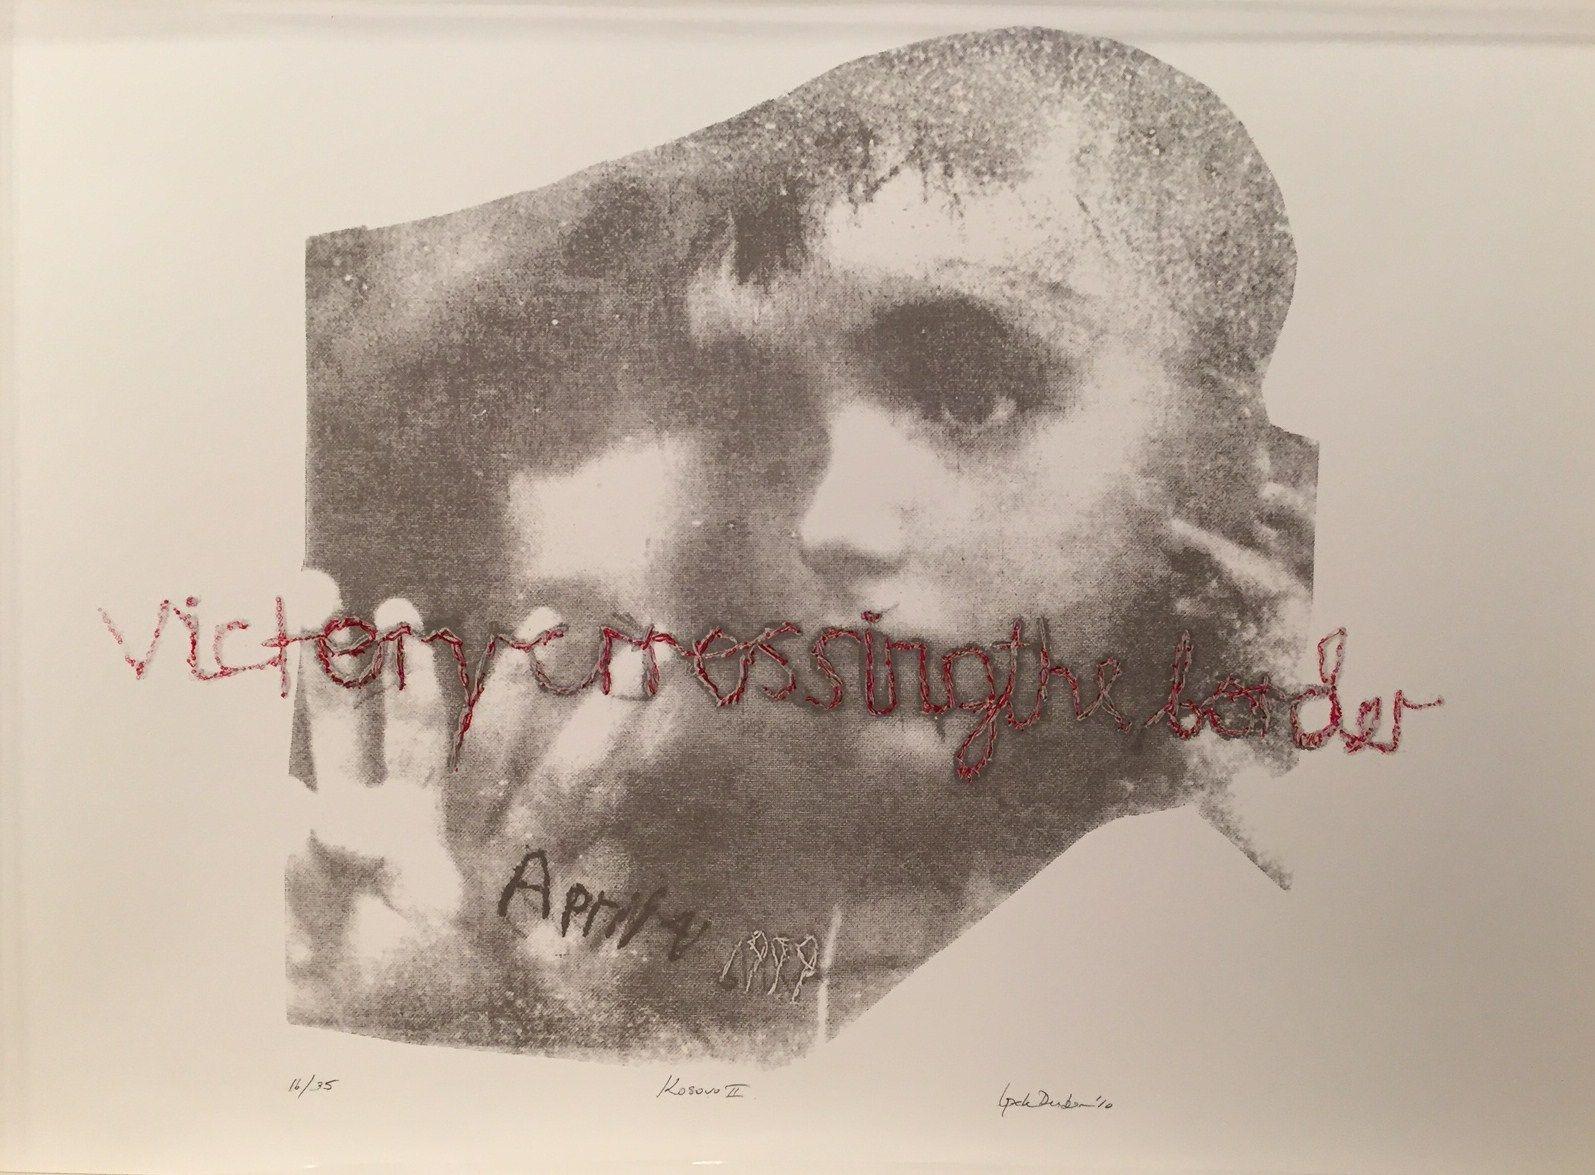 İpek Duben, Kosova II, 2010, Serigrafi baskı 16/35, 70x50 cm.